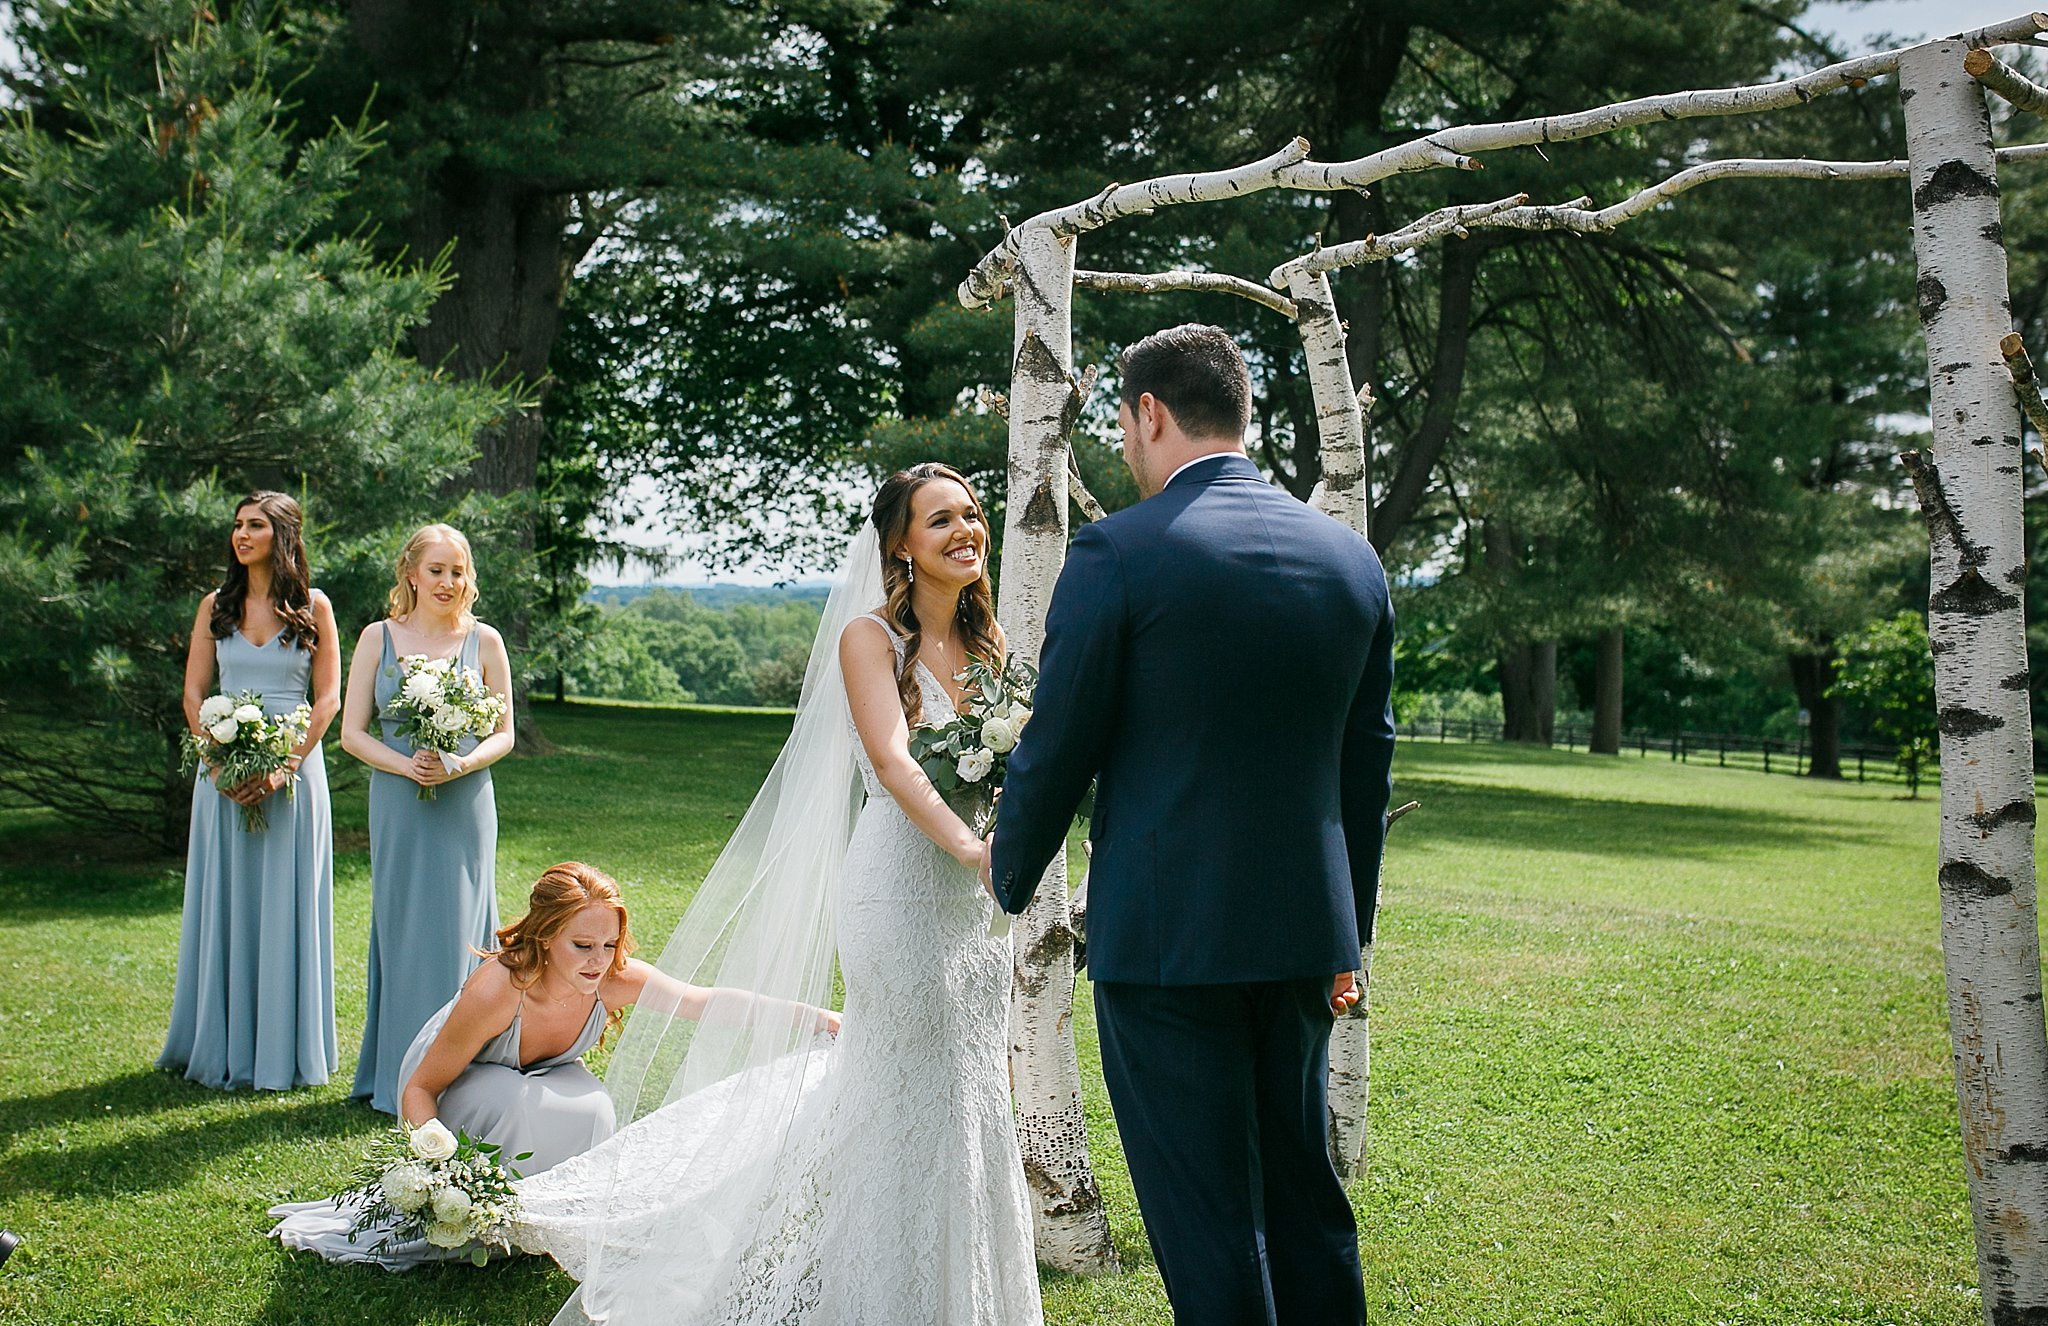 Hudson Valley Weddings at the Hill Hudson New York Wedding Photographer44.jpg